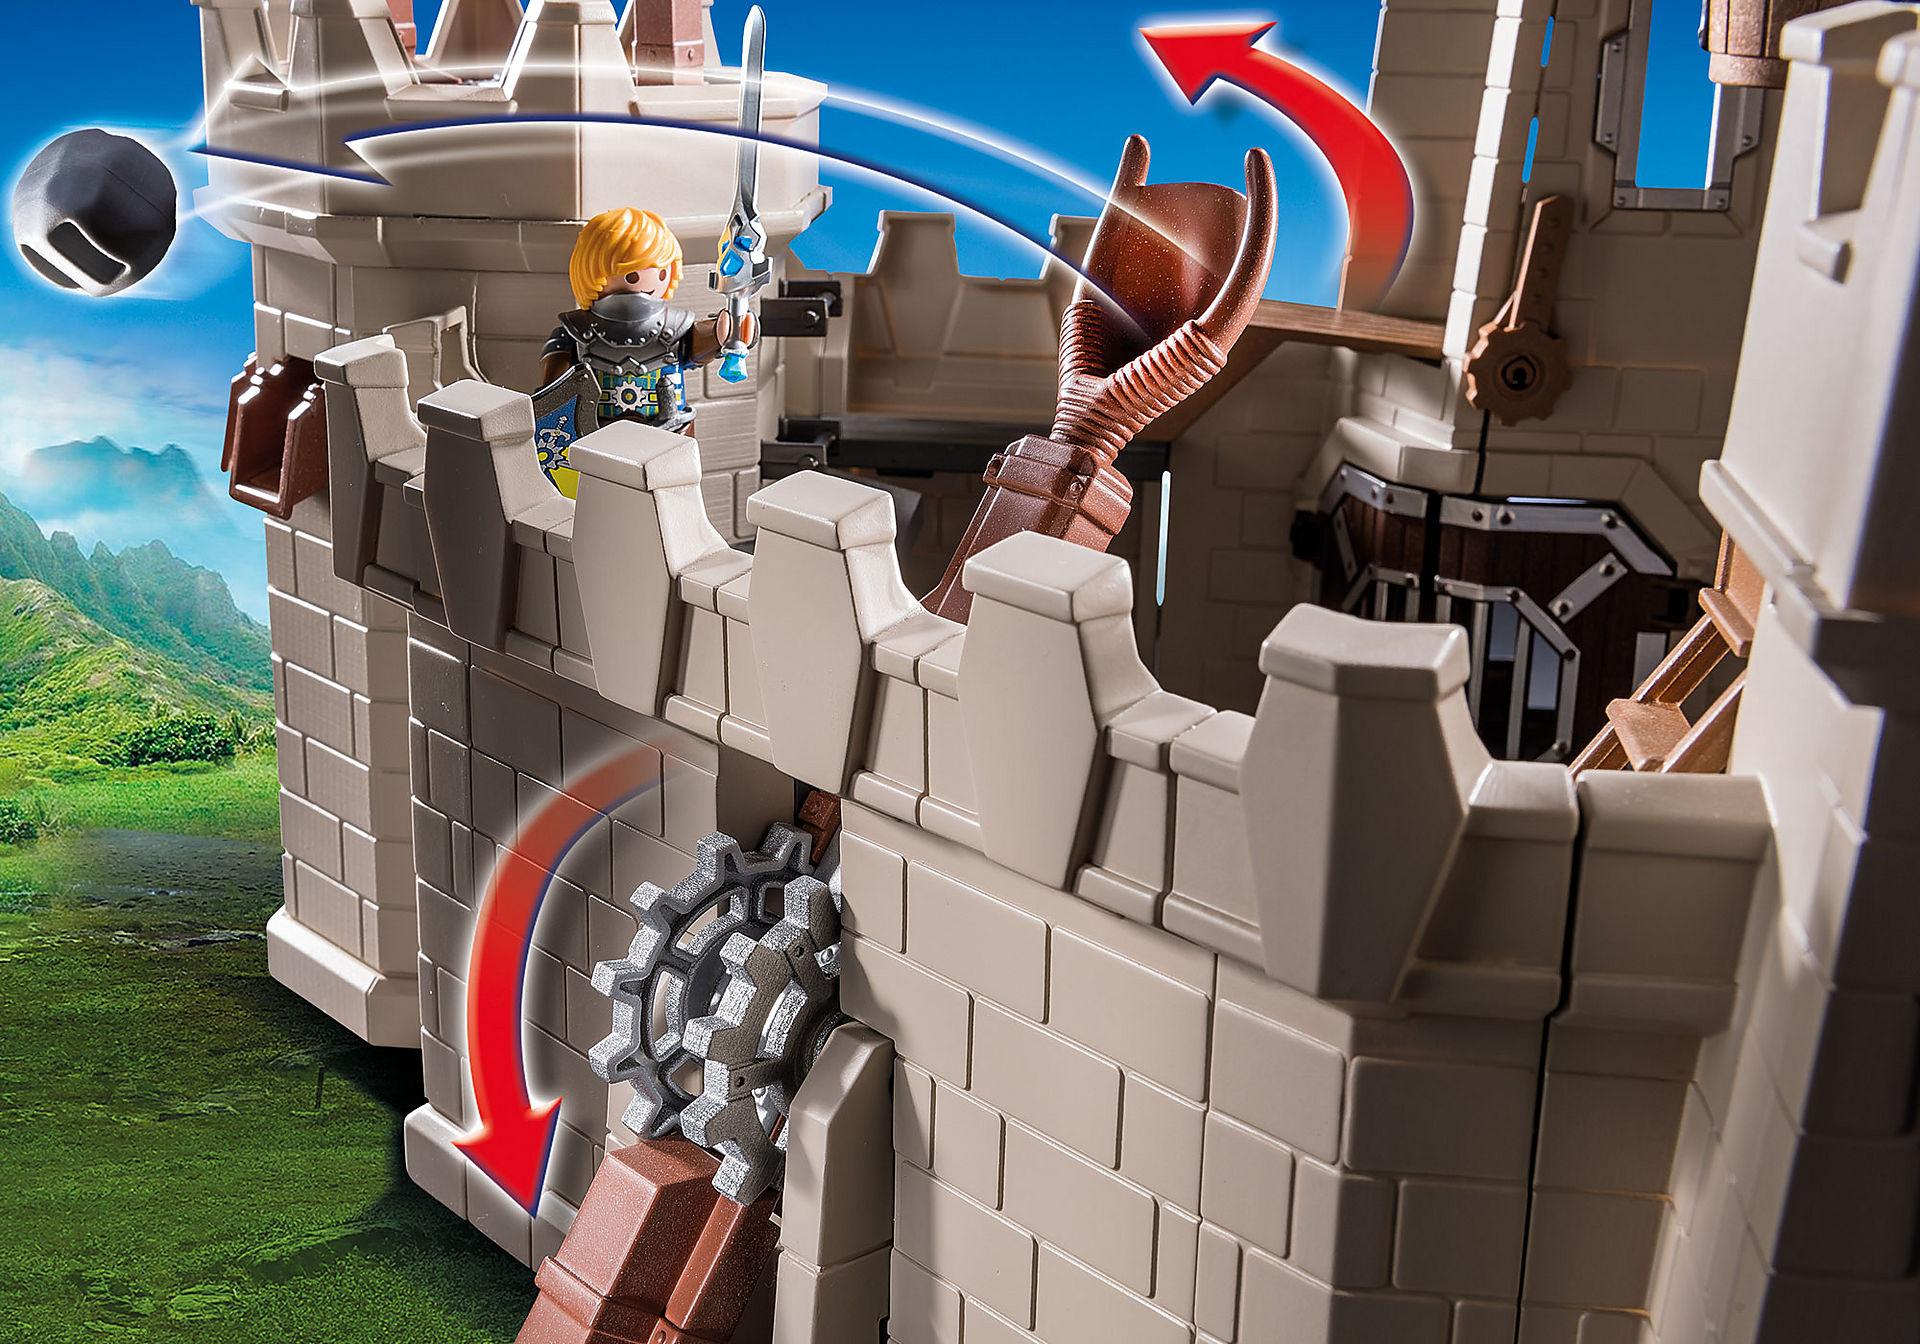 http://media.playmobil.com/i/playmobil/70220_product_extra5/Große Burg von Novelmore